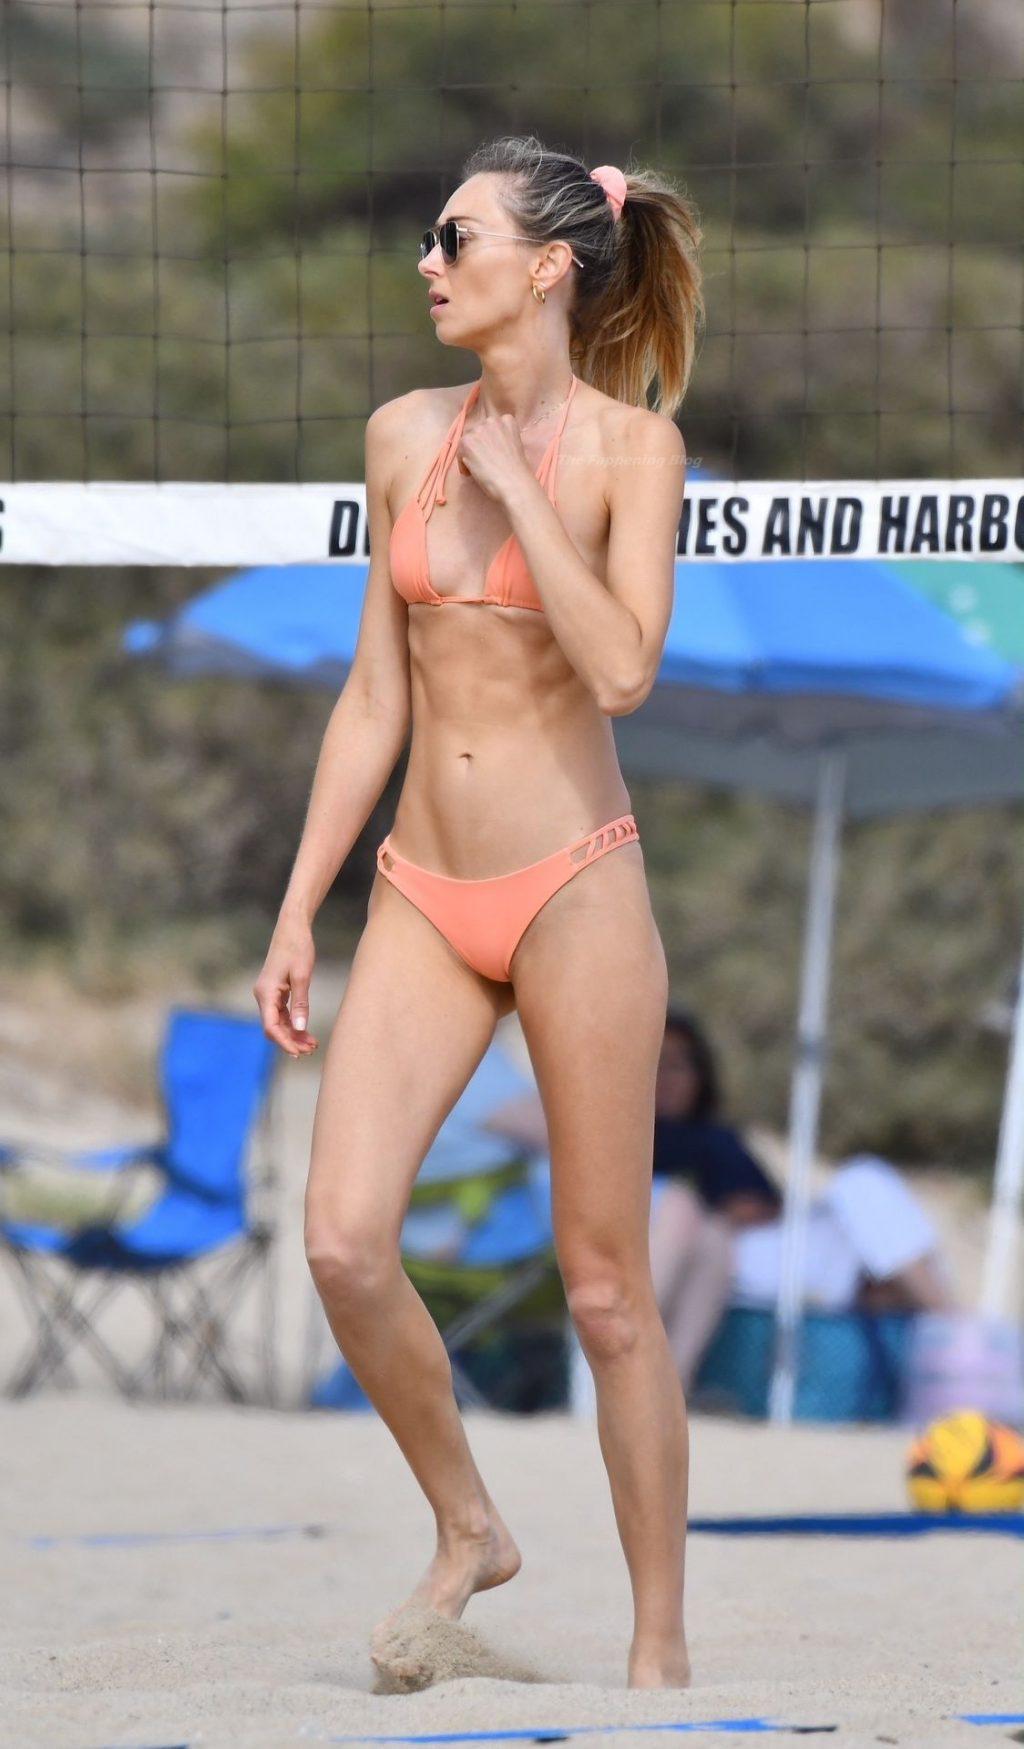 Ludi Delfino Displays Her Amazing Bikini Body in Santa Monica (39 Photos)